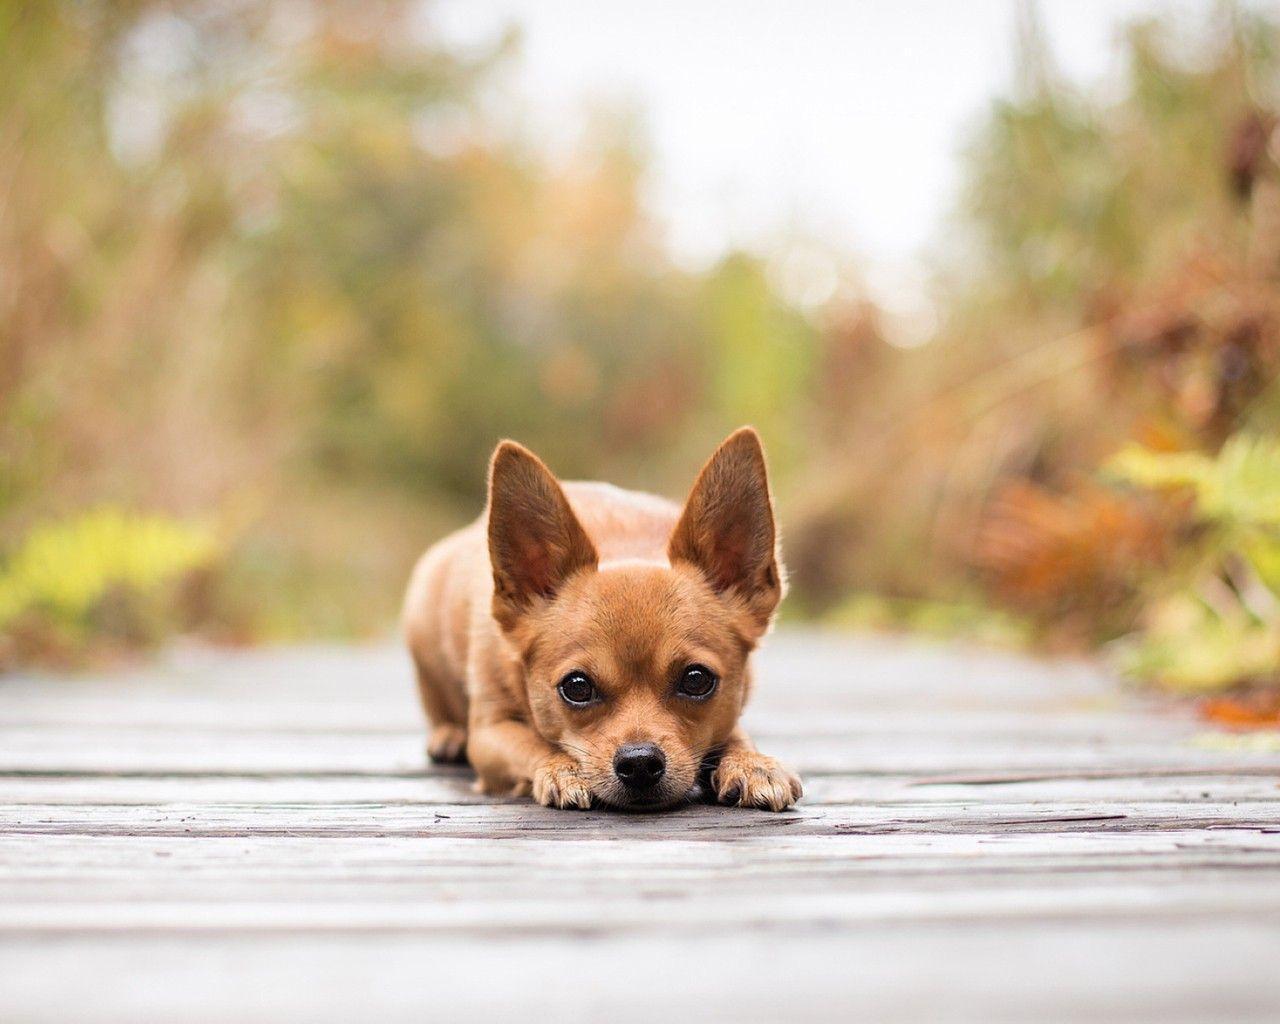 dog chihuahua background - photo #22